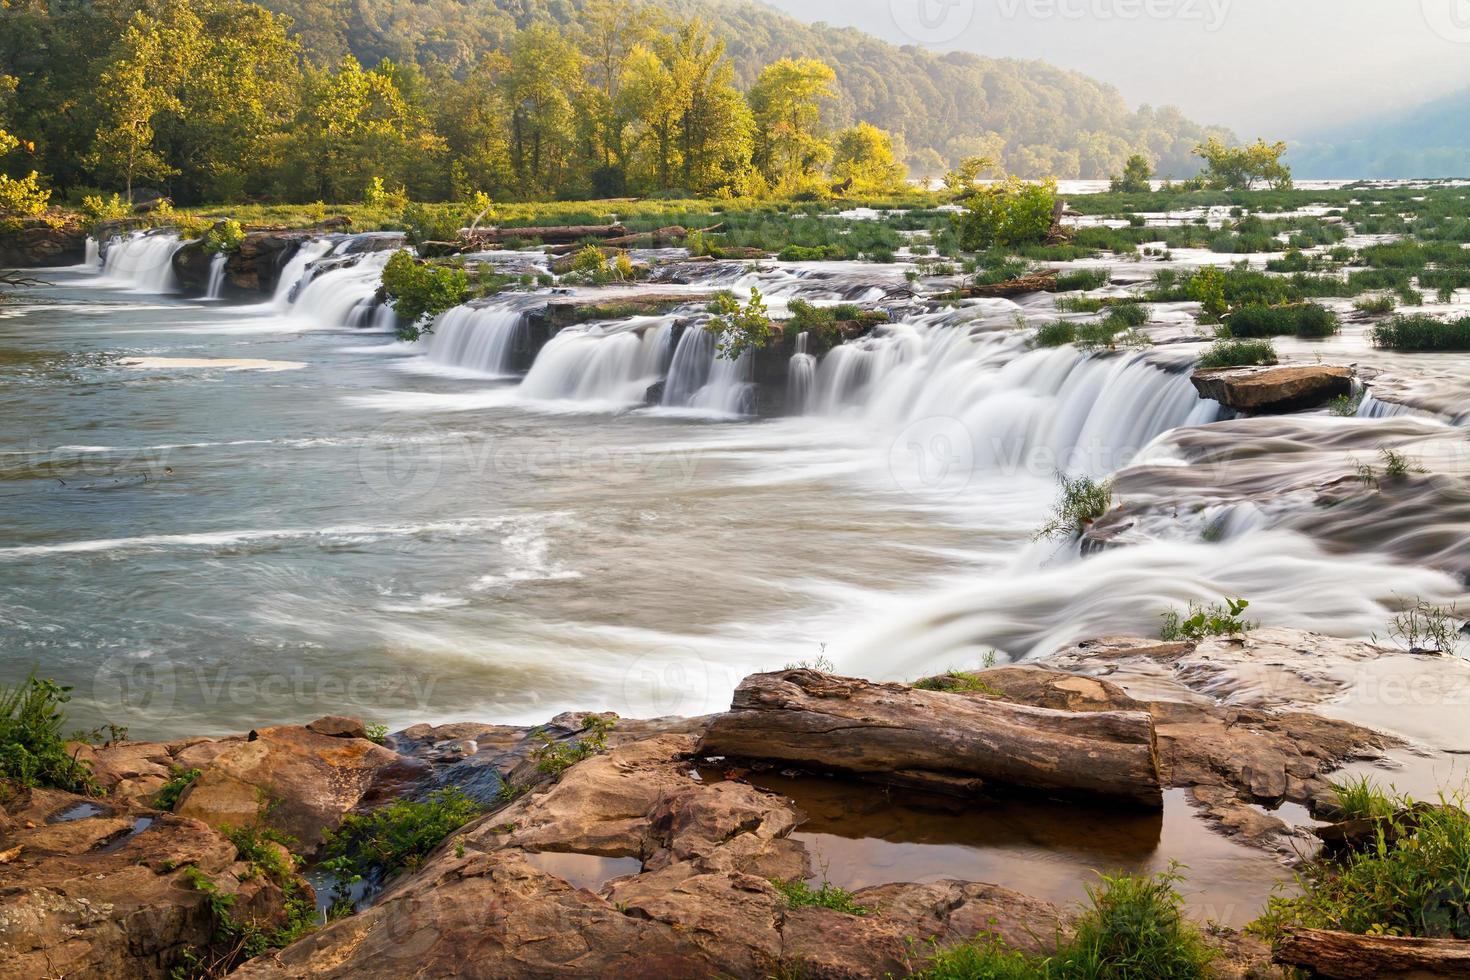 arenito cai no novo rio foto